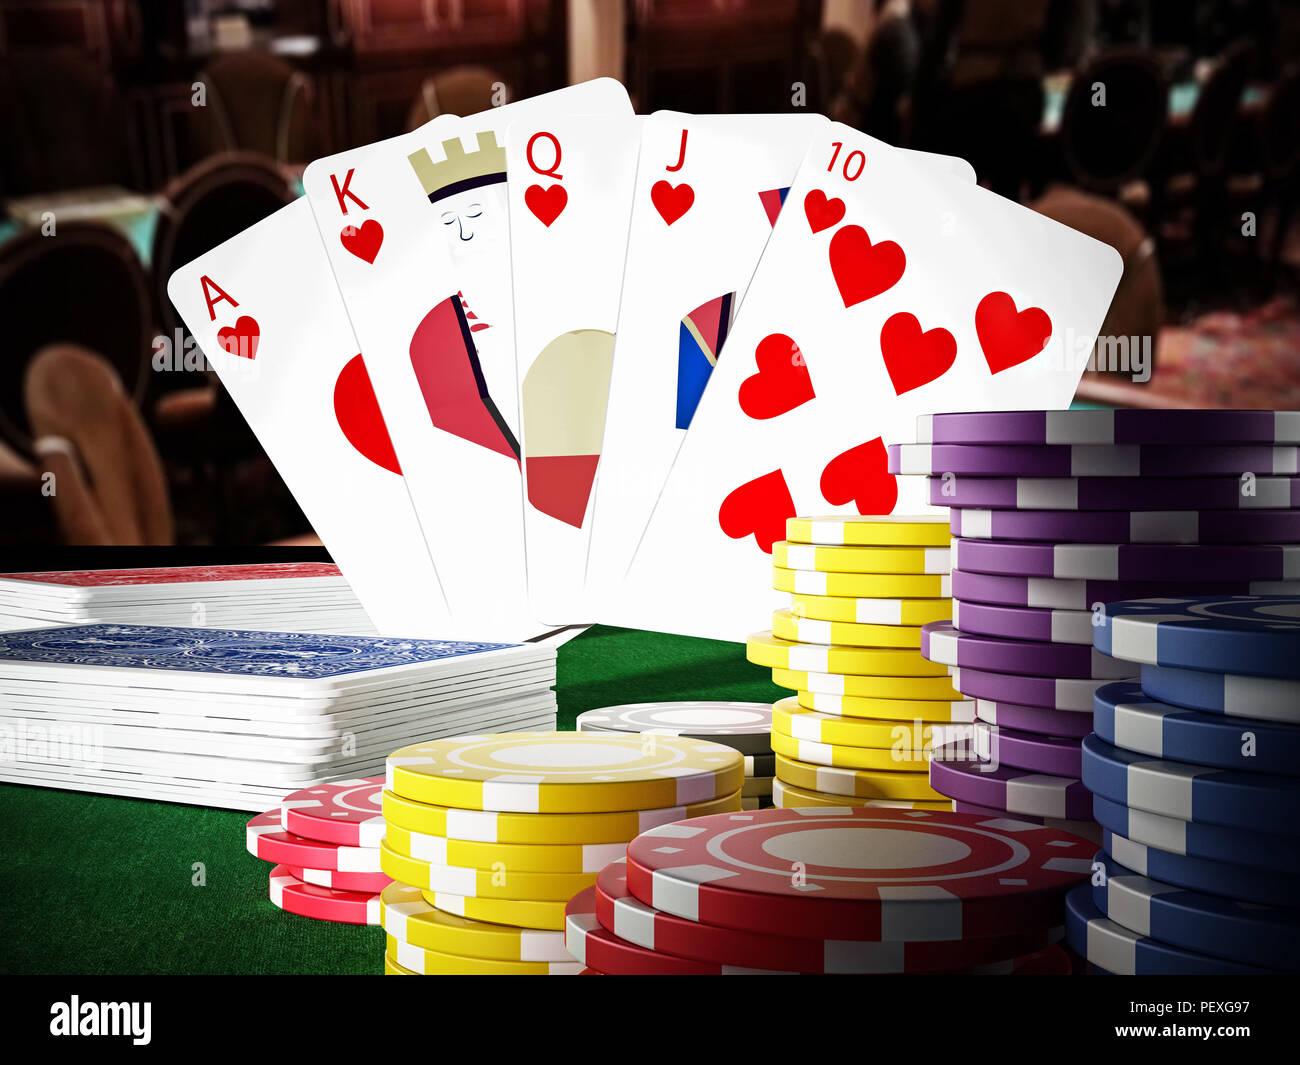 Poker royal flush hand and casino hands standing on poker table. 3D illustration. - Stock Image